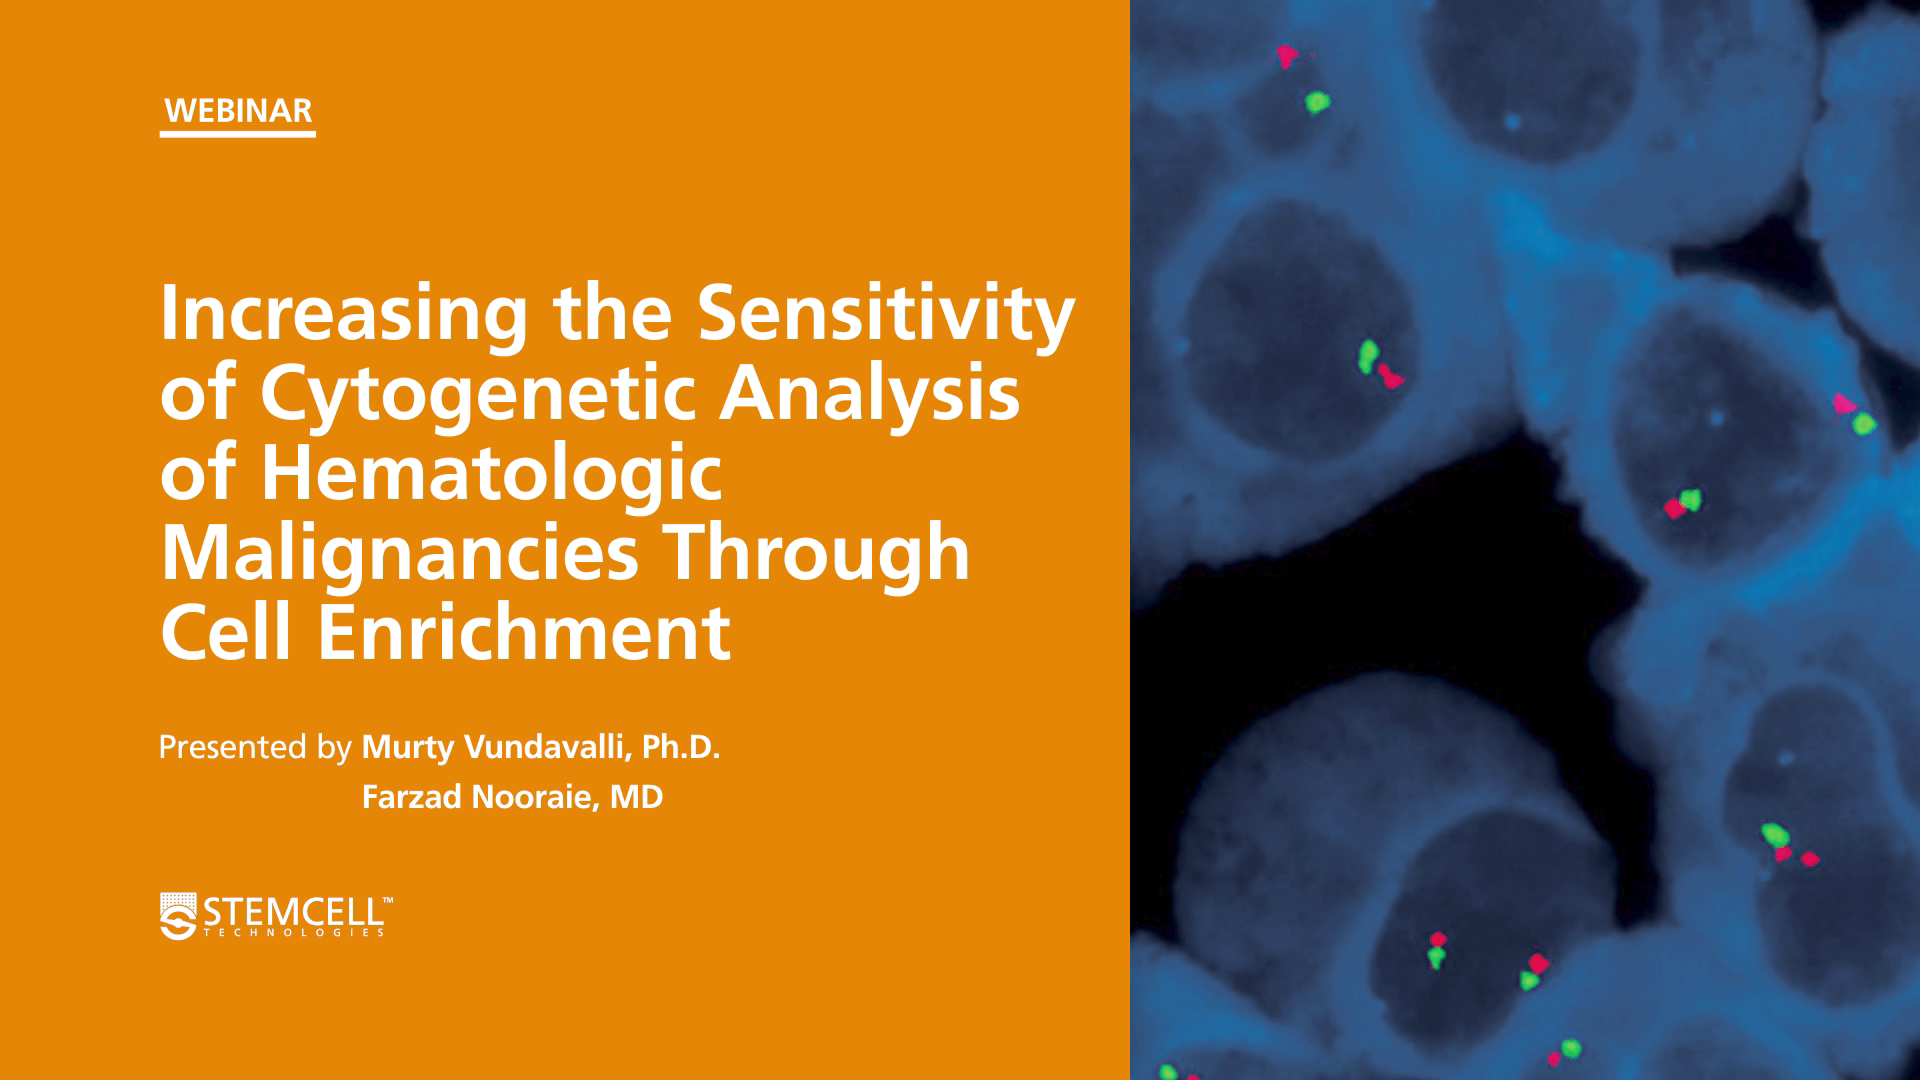 Increasing the Sensitivity of Cytogenetic Analysis of Hematologic Malignancies Through Cell Enrichment